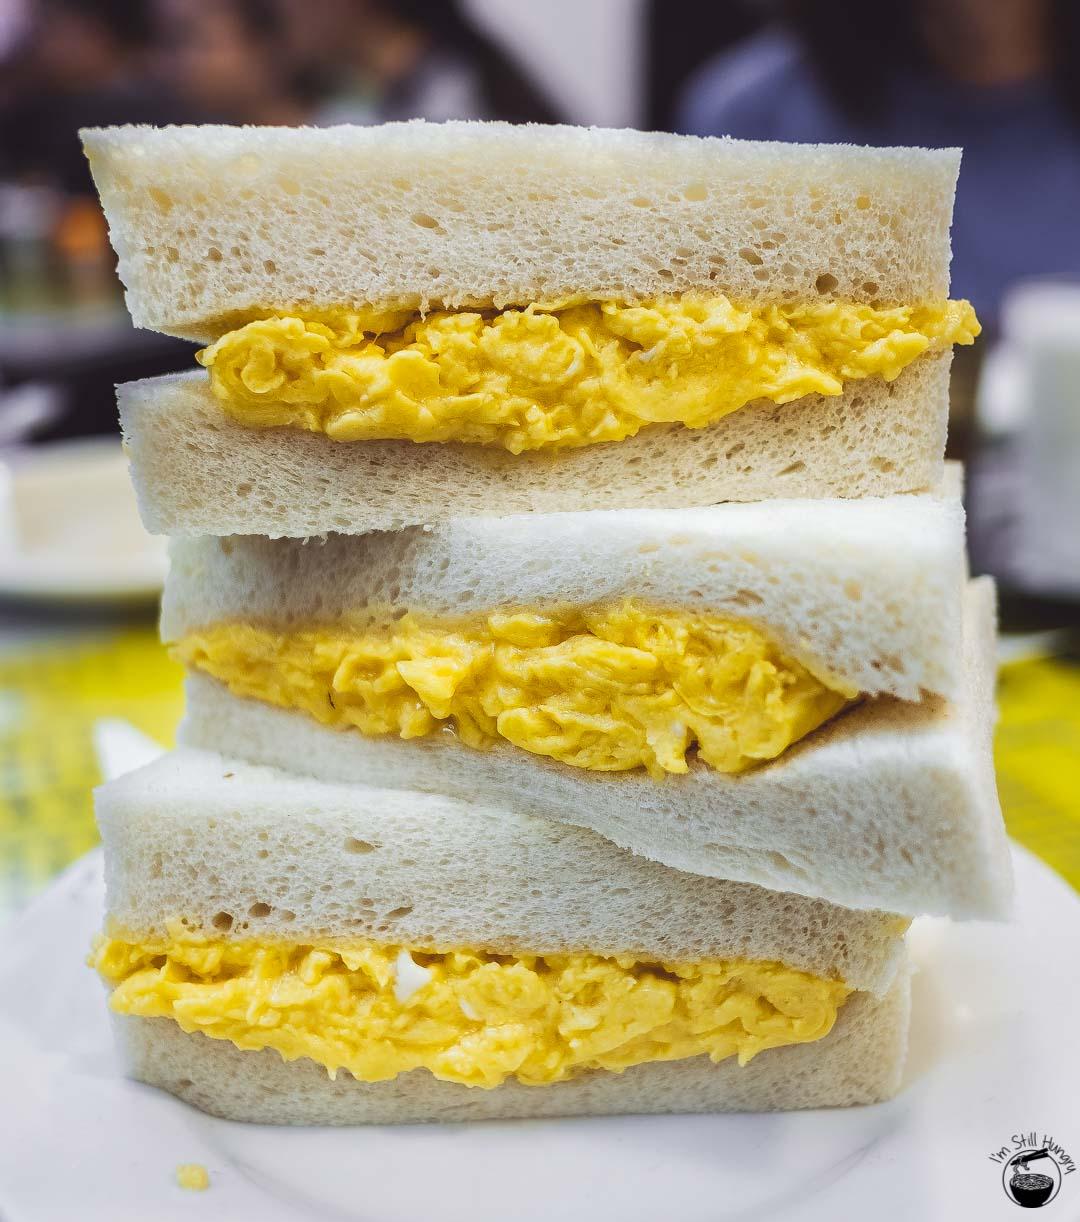 Australia Dairy Company Scrambled egg sandwich